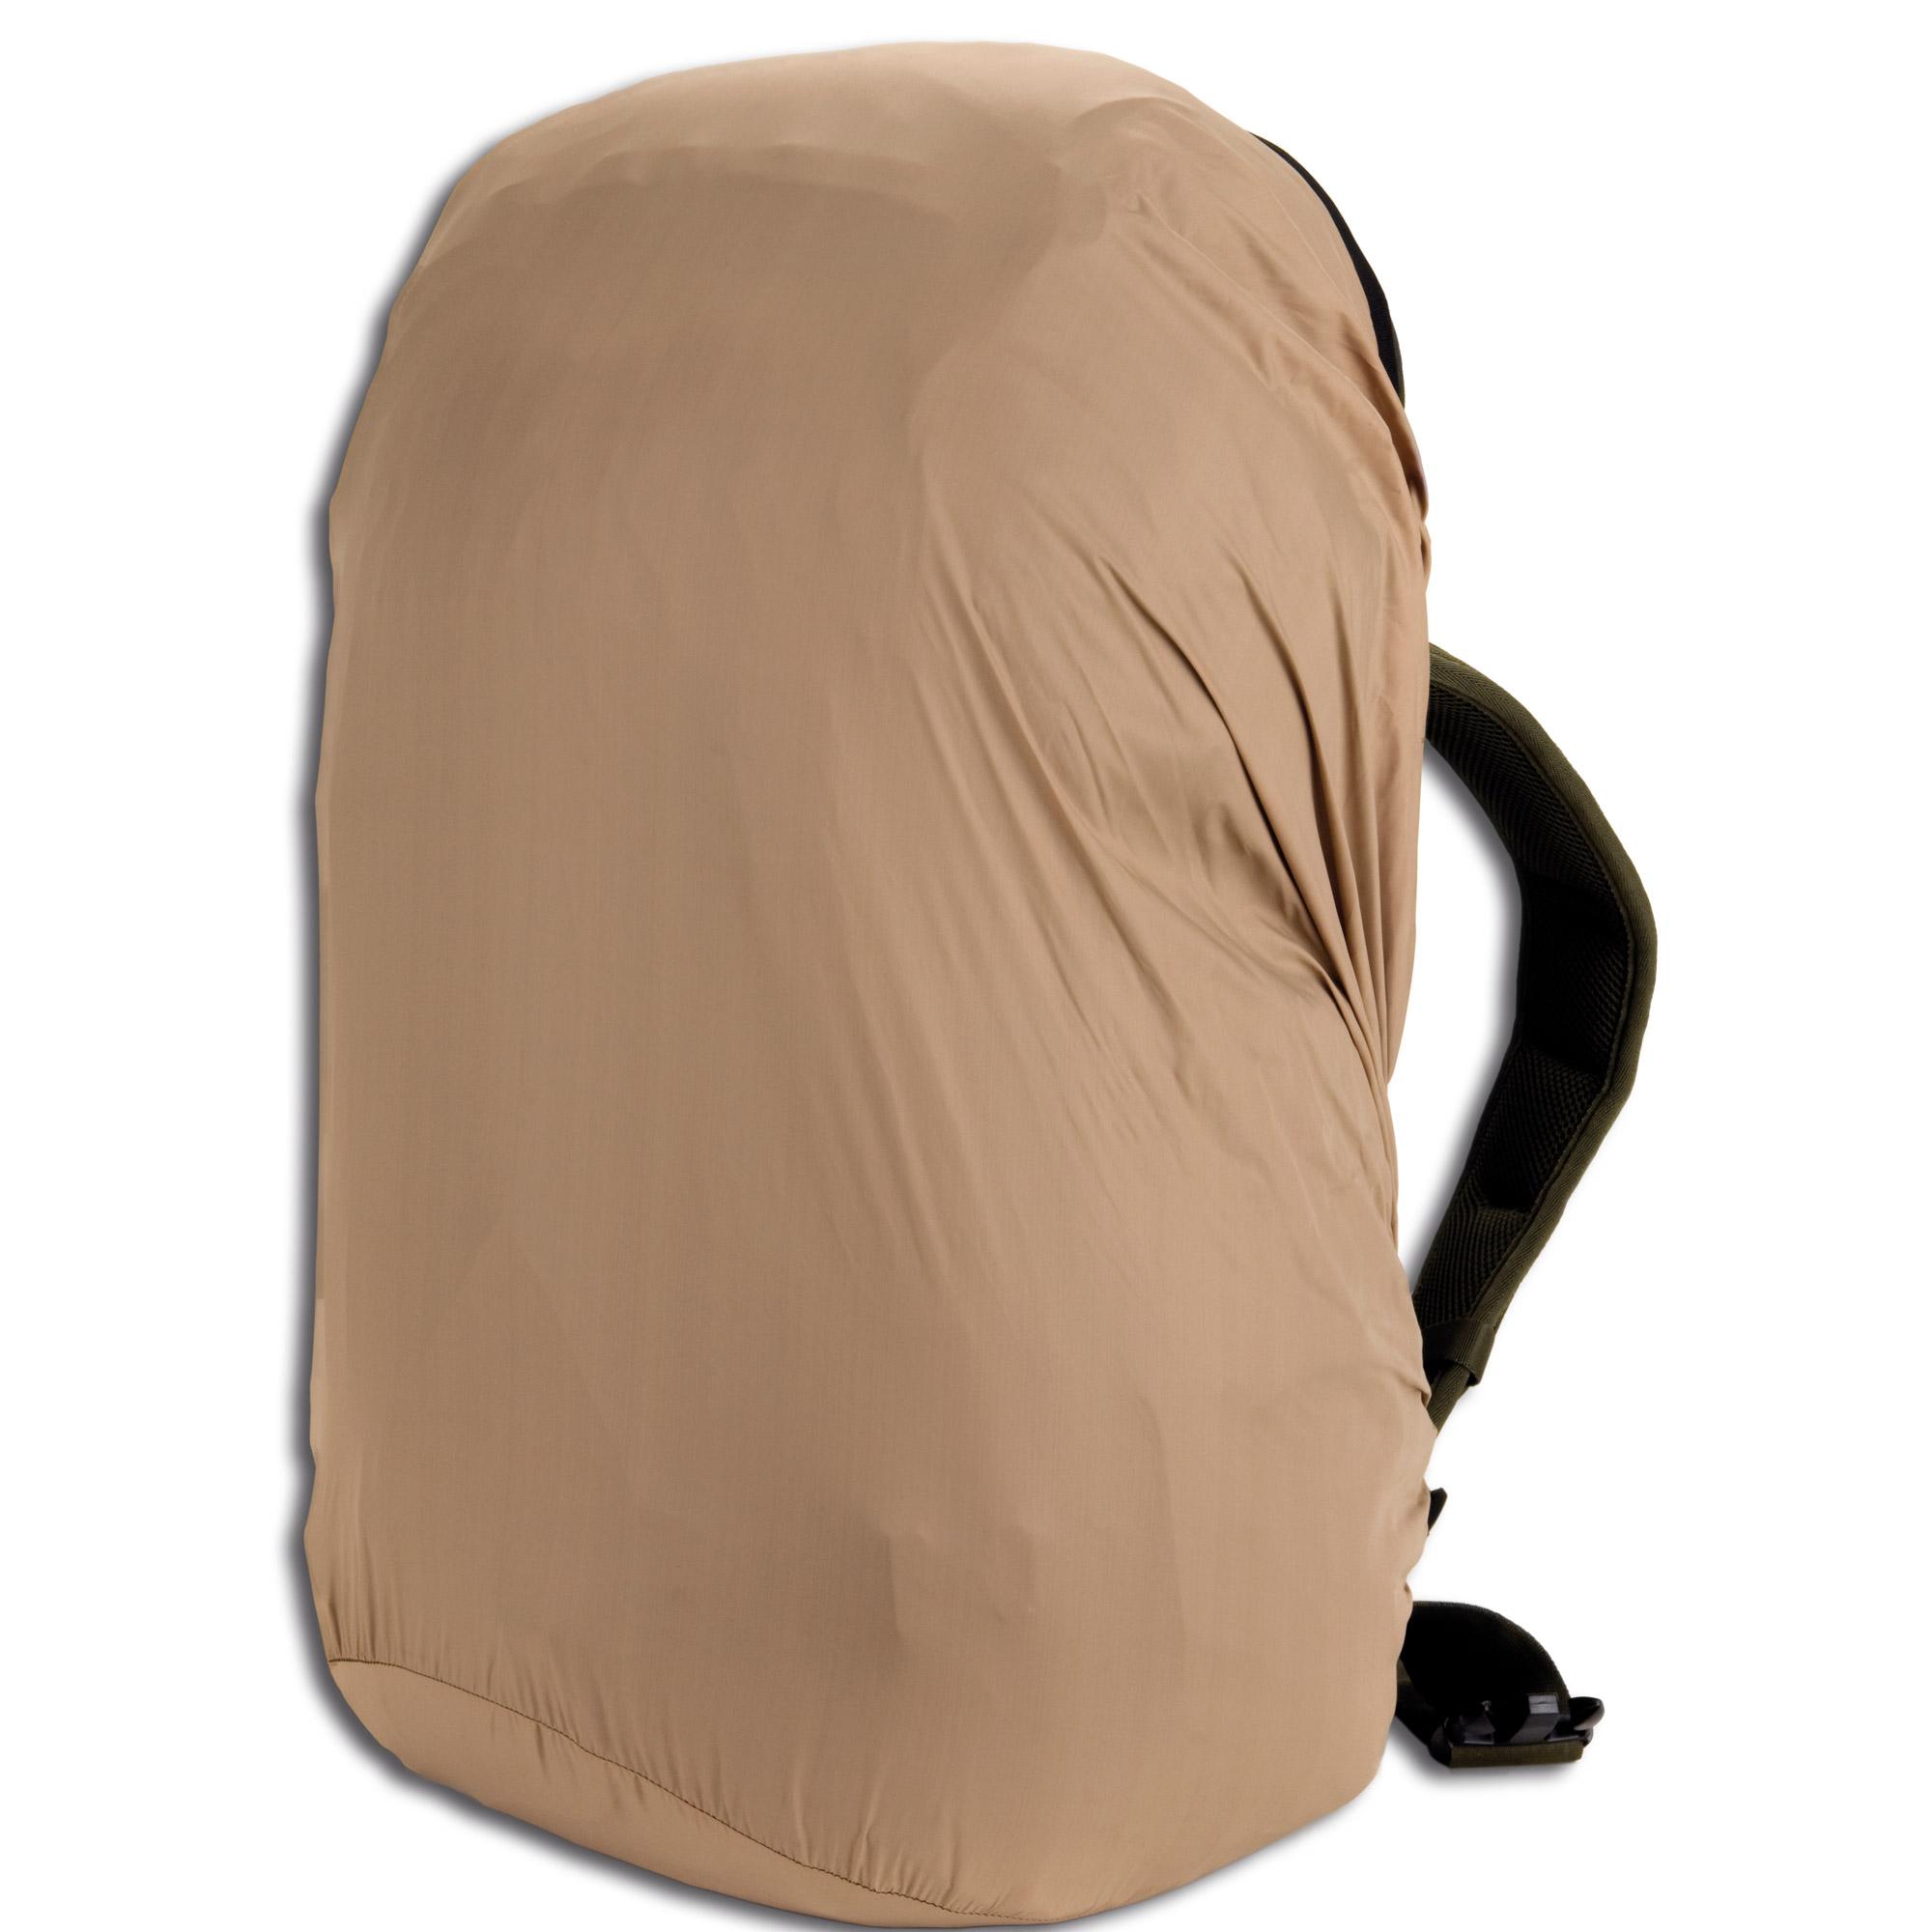 Snugpak Rucksackbezug Aquacover 35 L desert tan